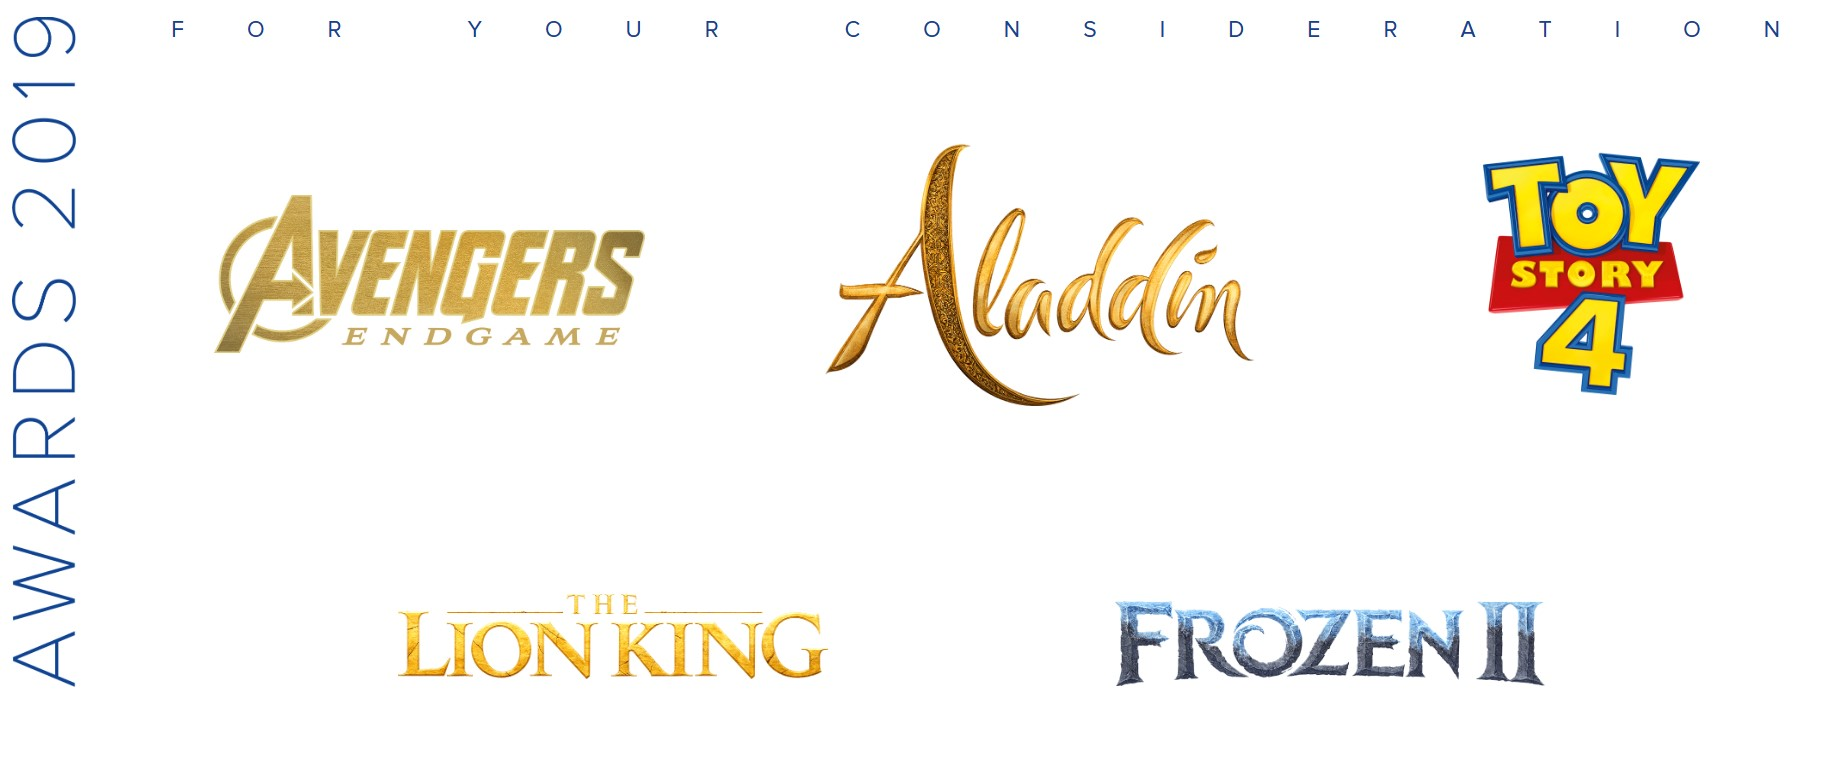 Disney Oscars No Brie Larson or Captain Marvel